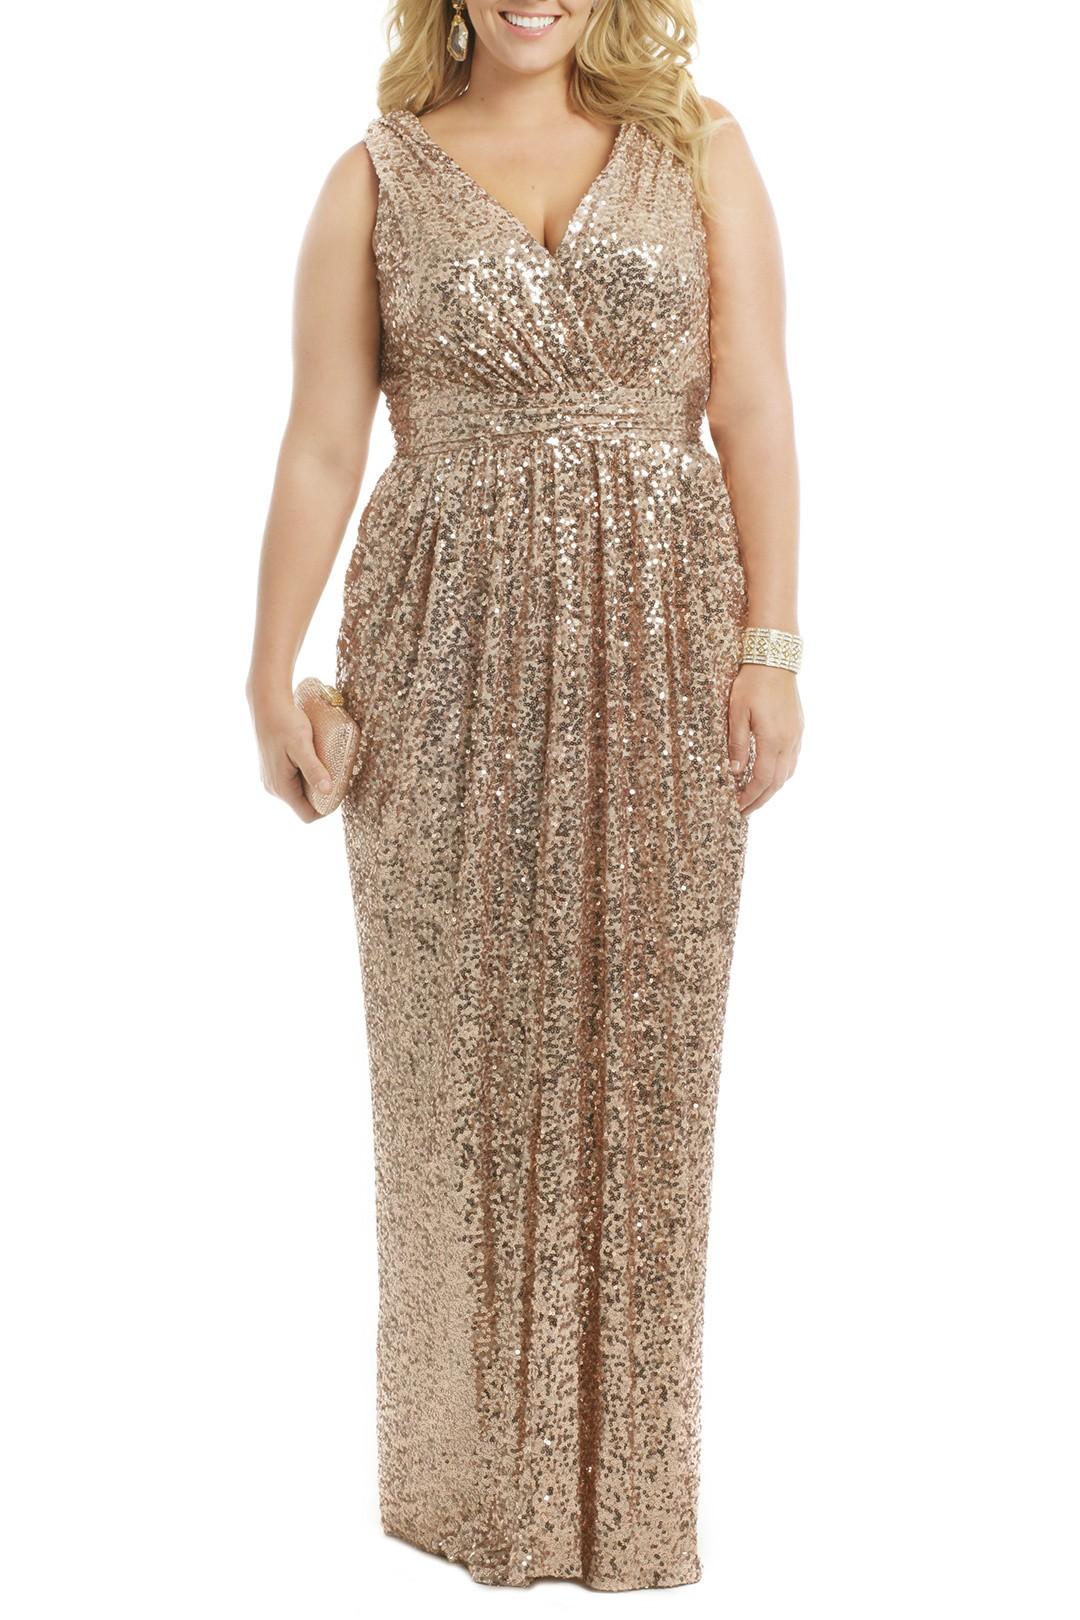 Sequined bridesmaid dress badgley mischka ombrellifo Choice Image